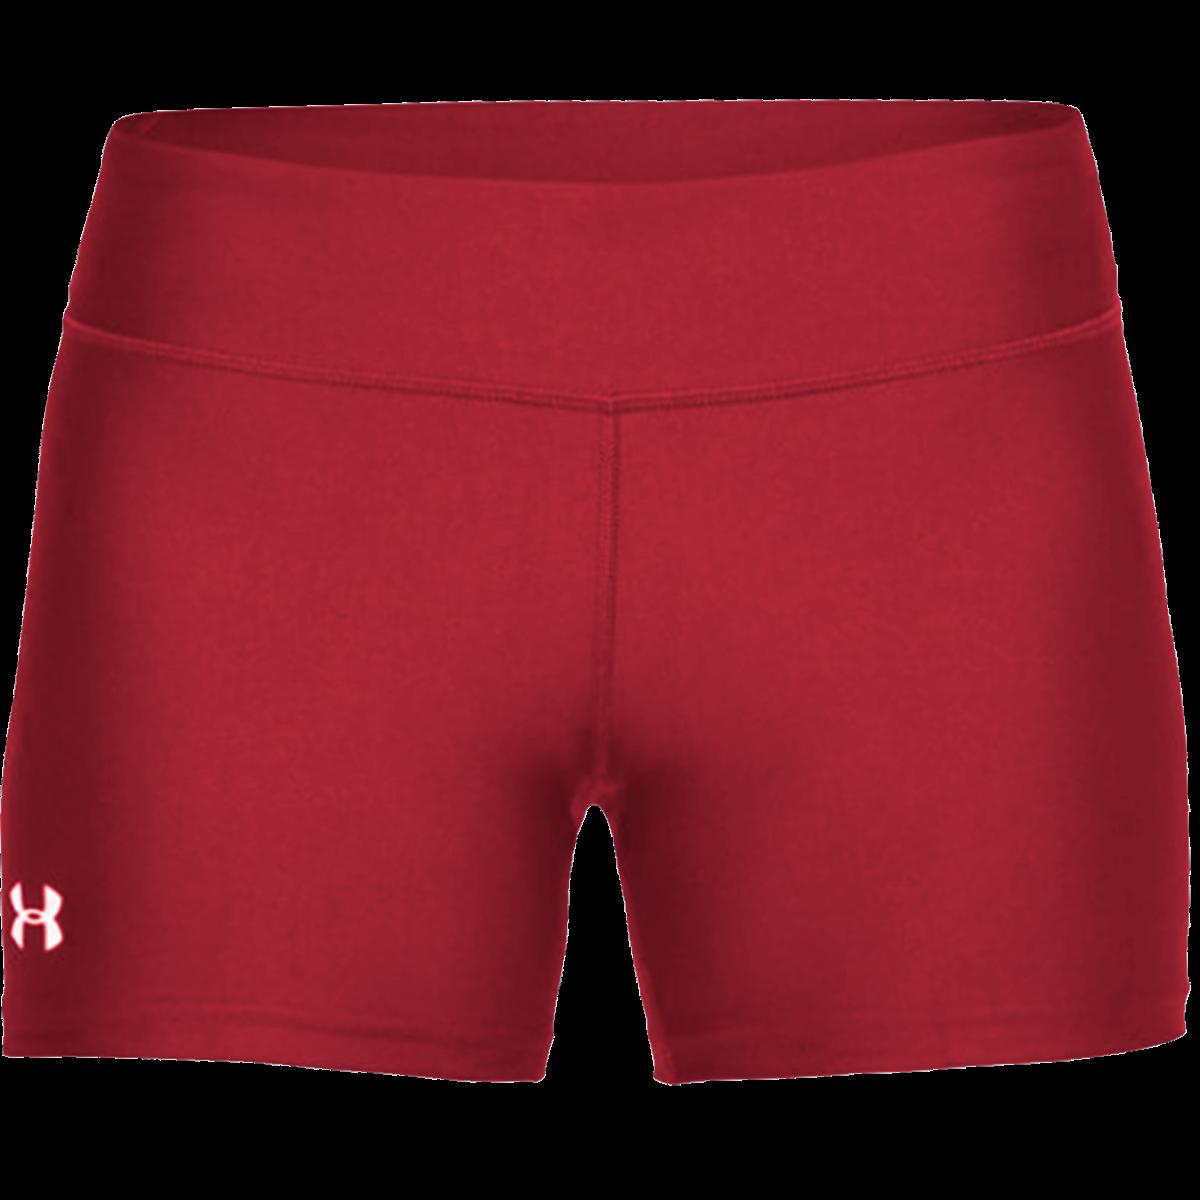 Under Armour Compression Shorts Women Spandex Shorts Volleyball Spandex Shorts Nike Women Outfits